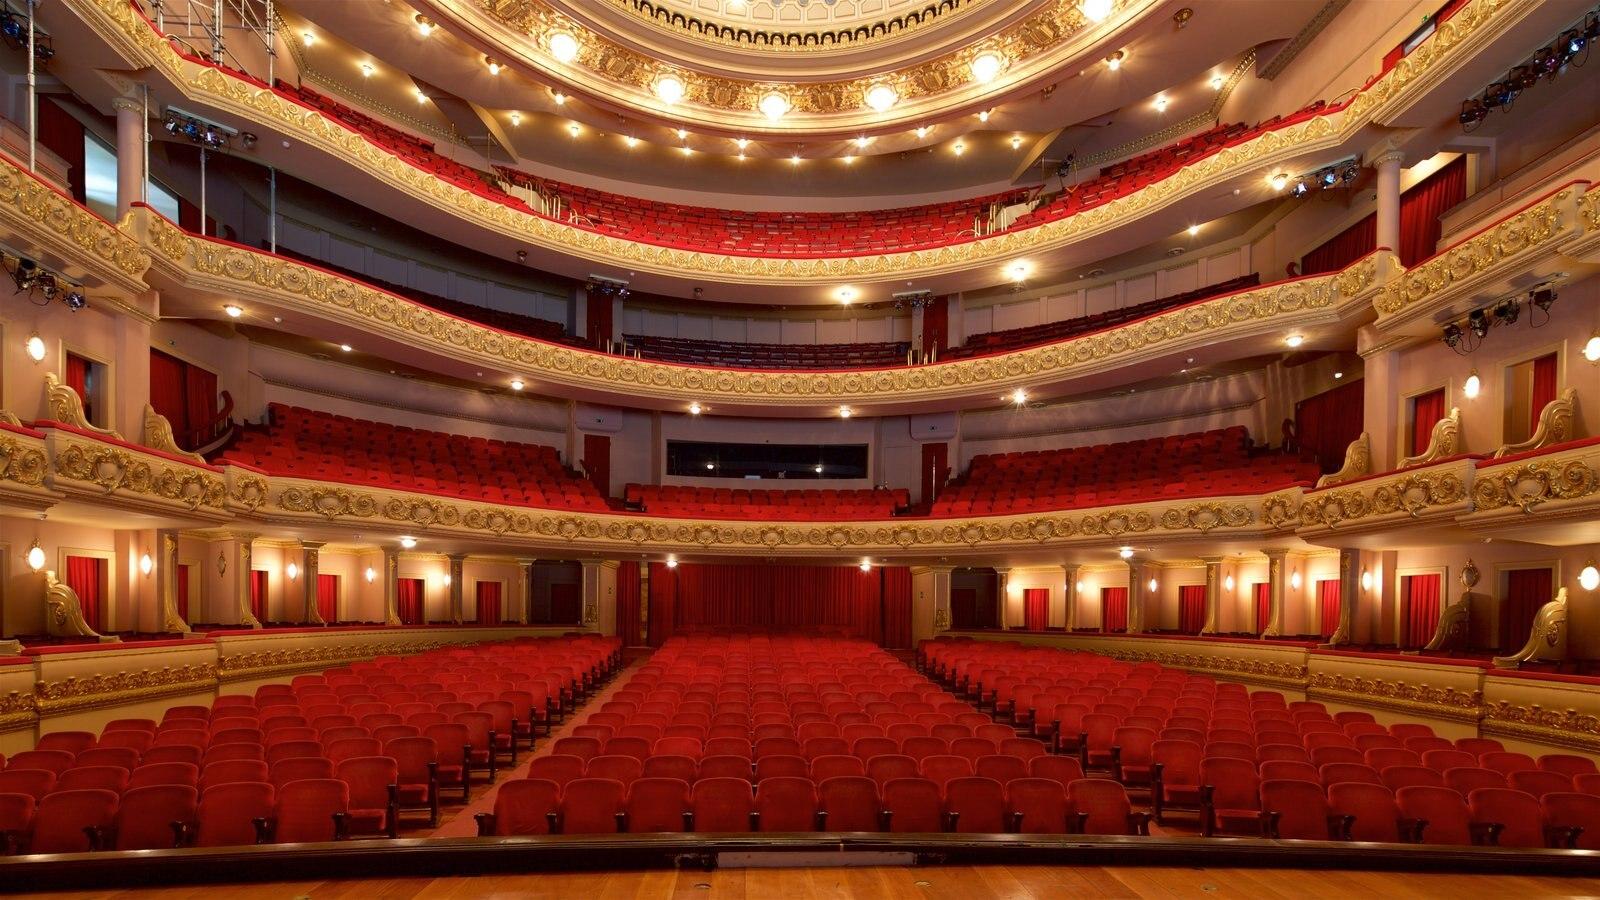 Teatro Municipal mostrando elementos de patrimônio, vistas internas e cenas de teatro